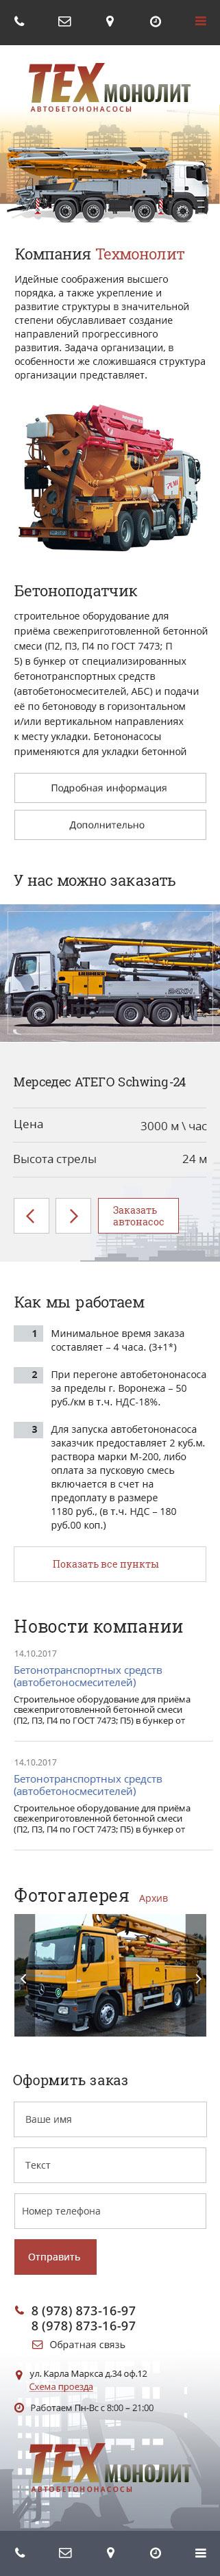 b2b сайты примеры Техмонолит 320 px